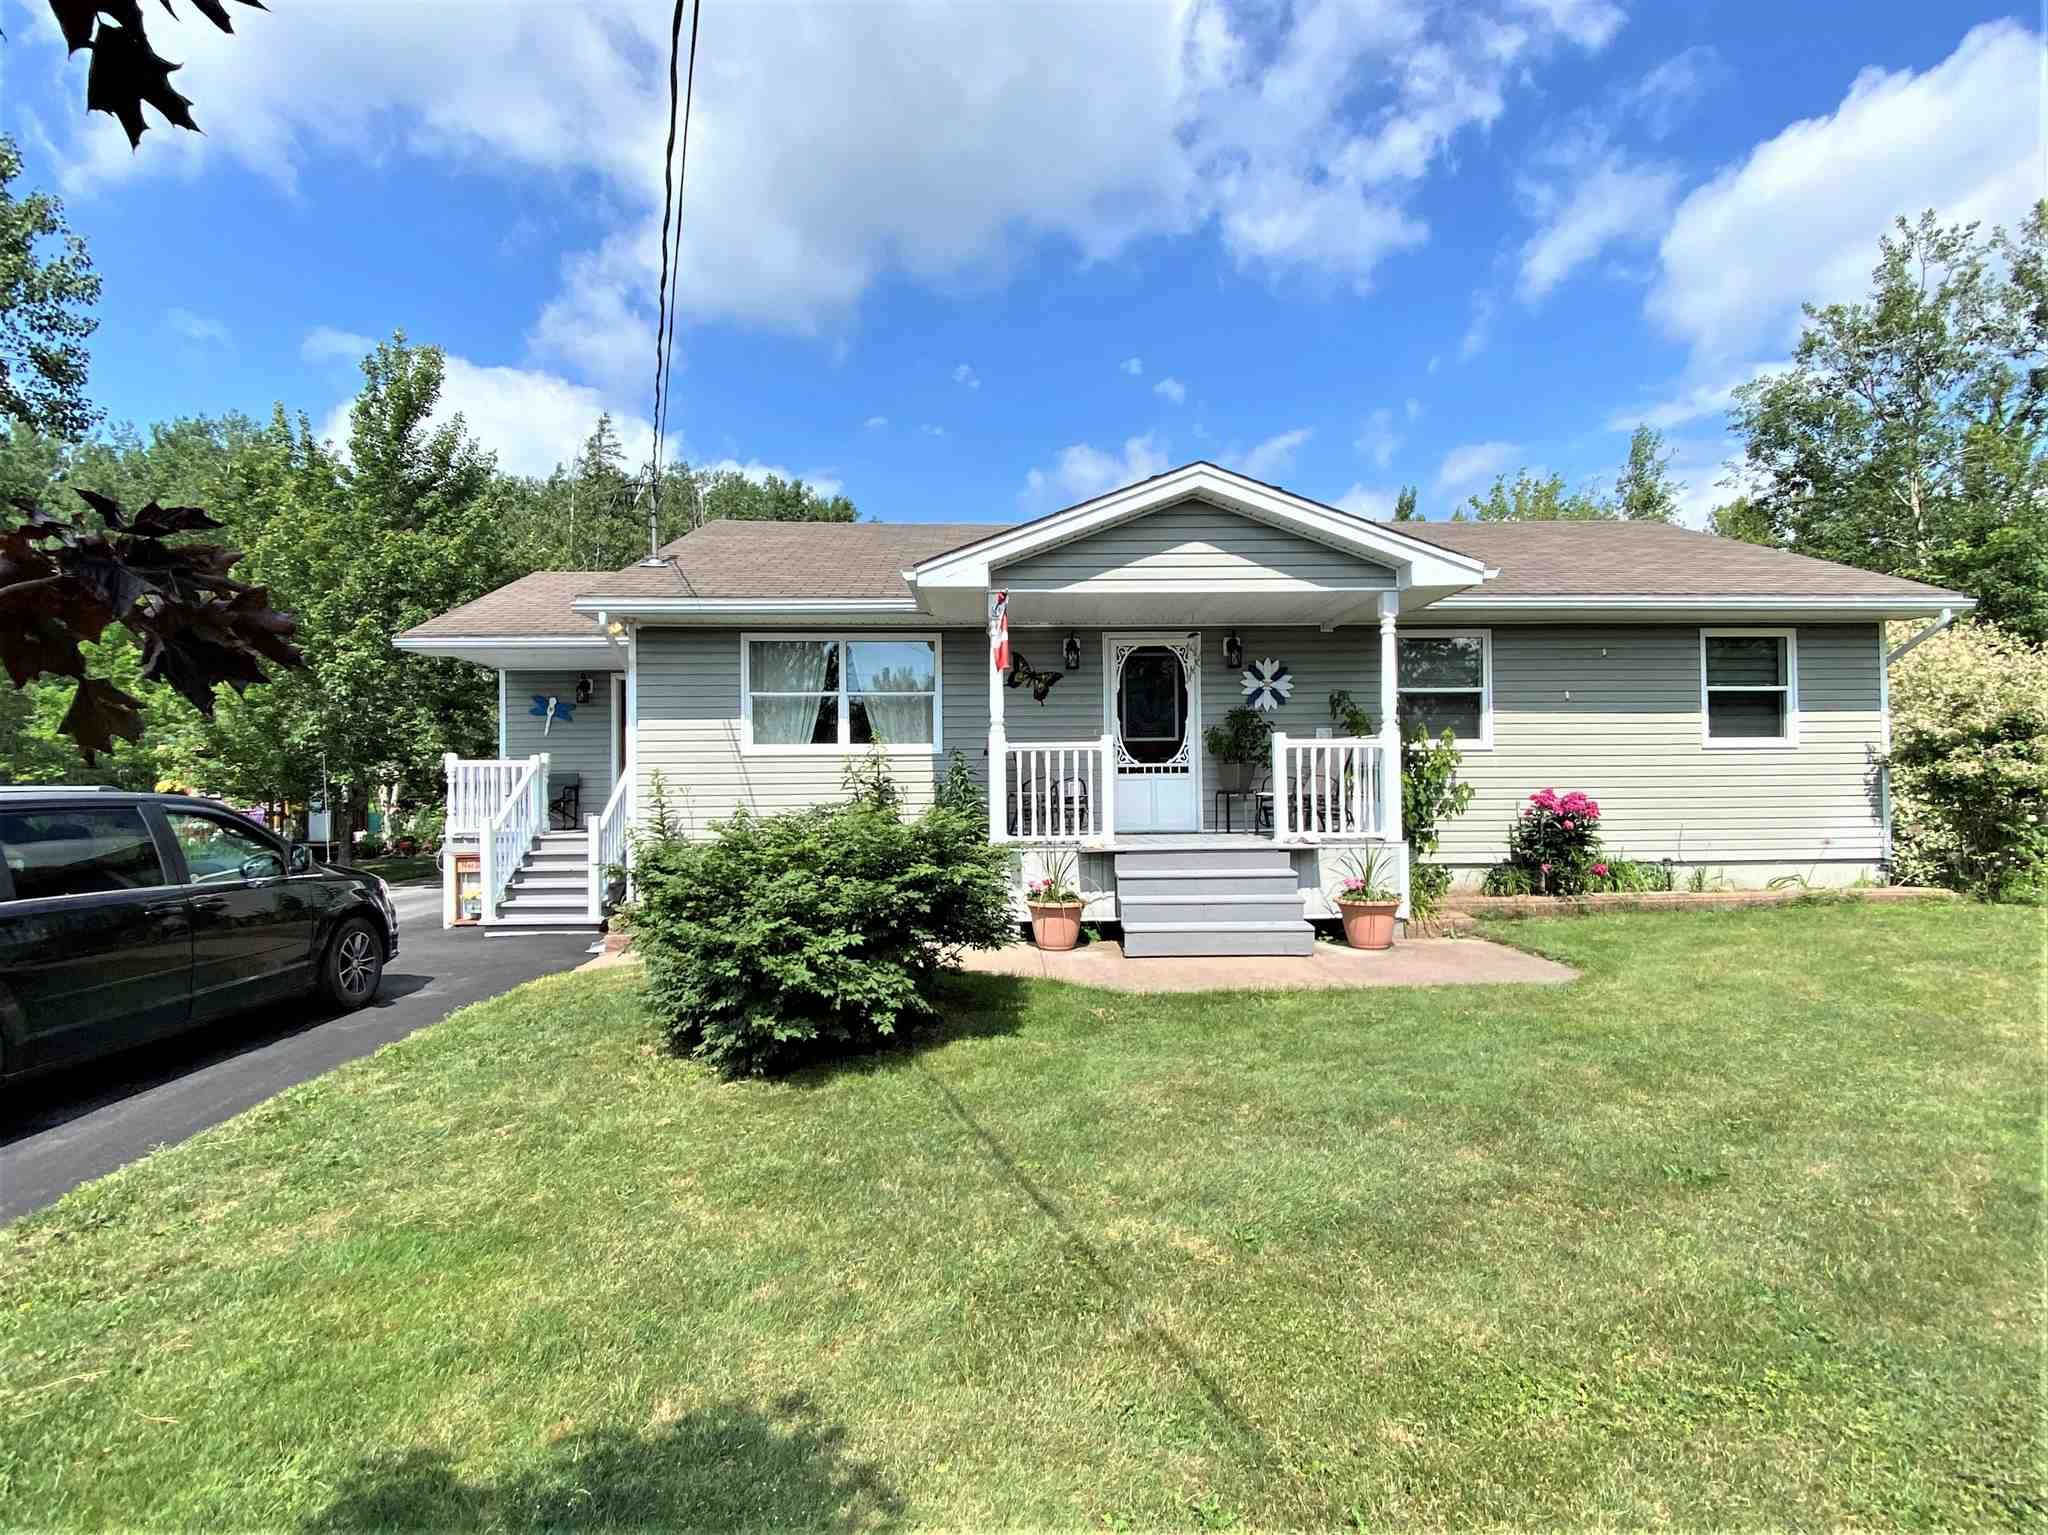 Main Photo: 1636 Porters Lane in Westville: 107-Trenton,Westville,Pictou Residential for sale (Northern Region)  : MLS®# 202117161